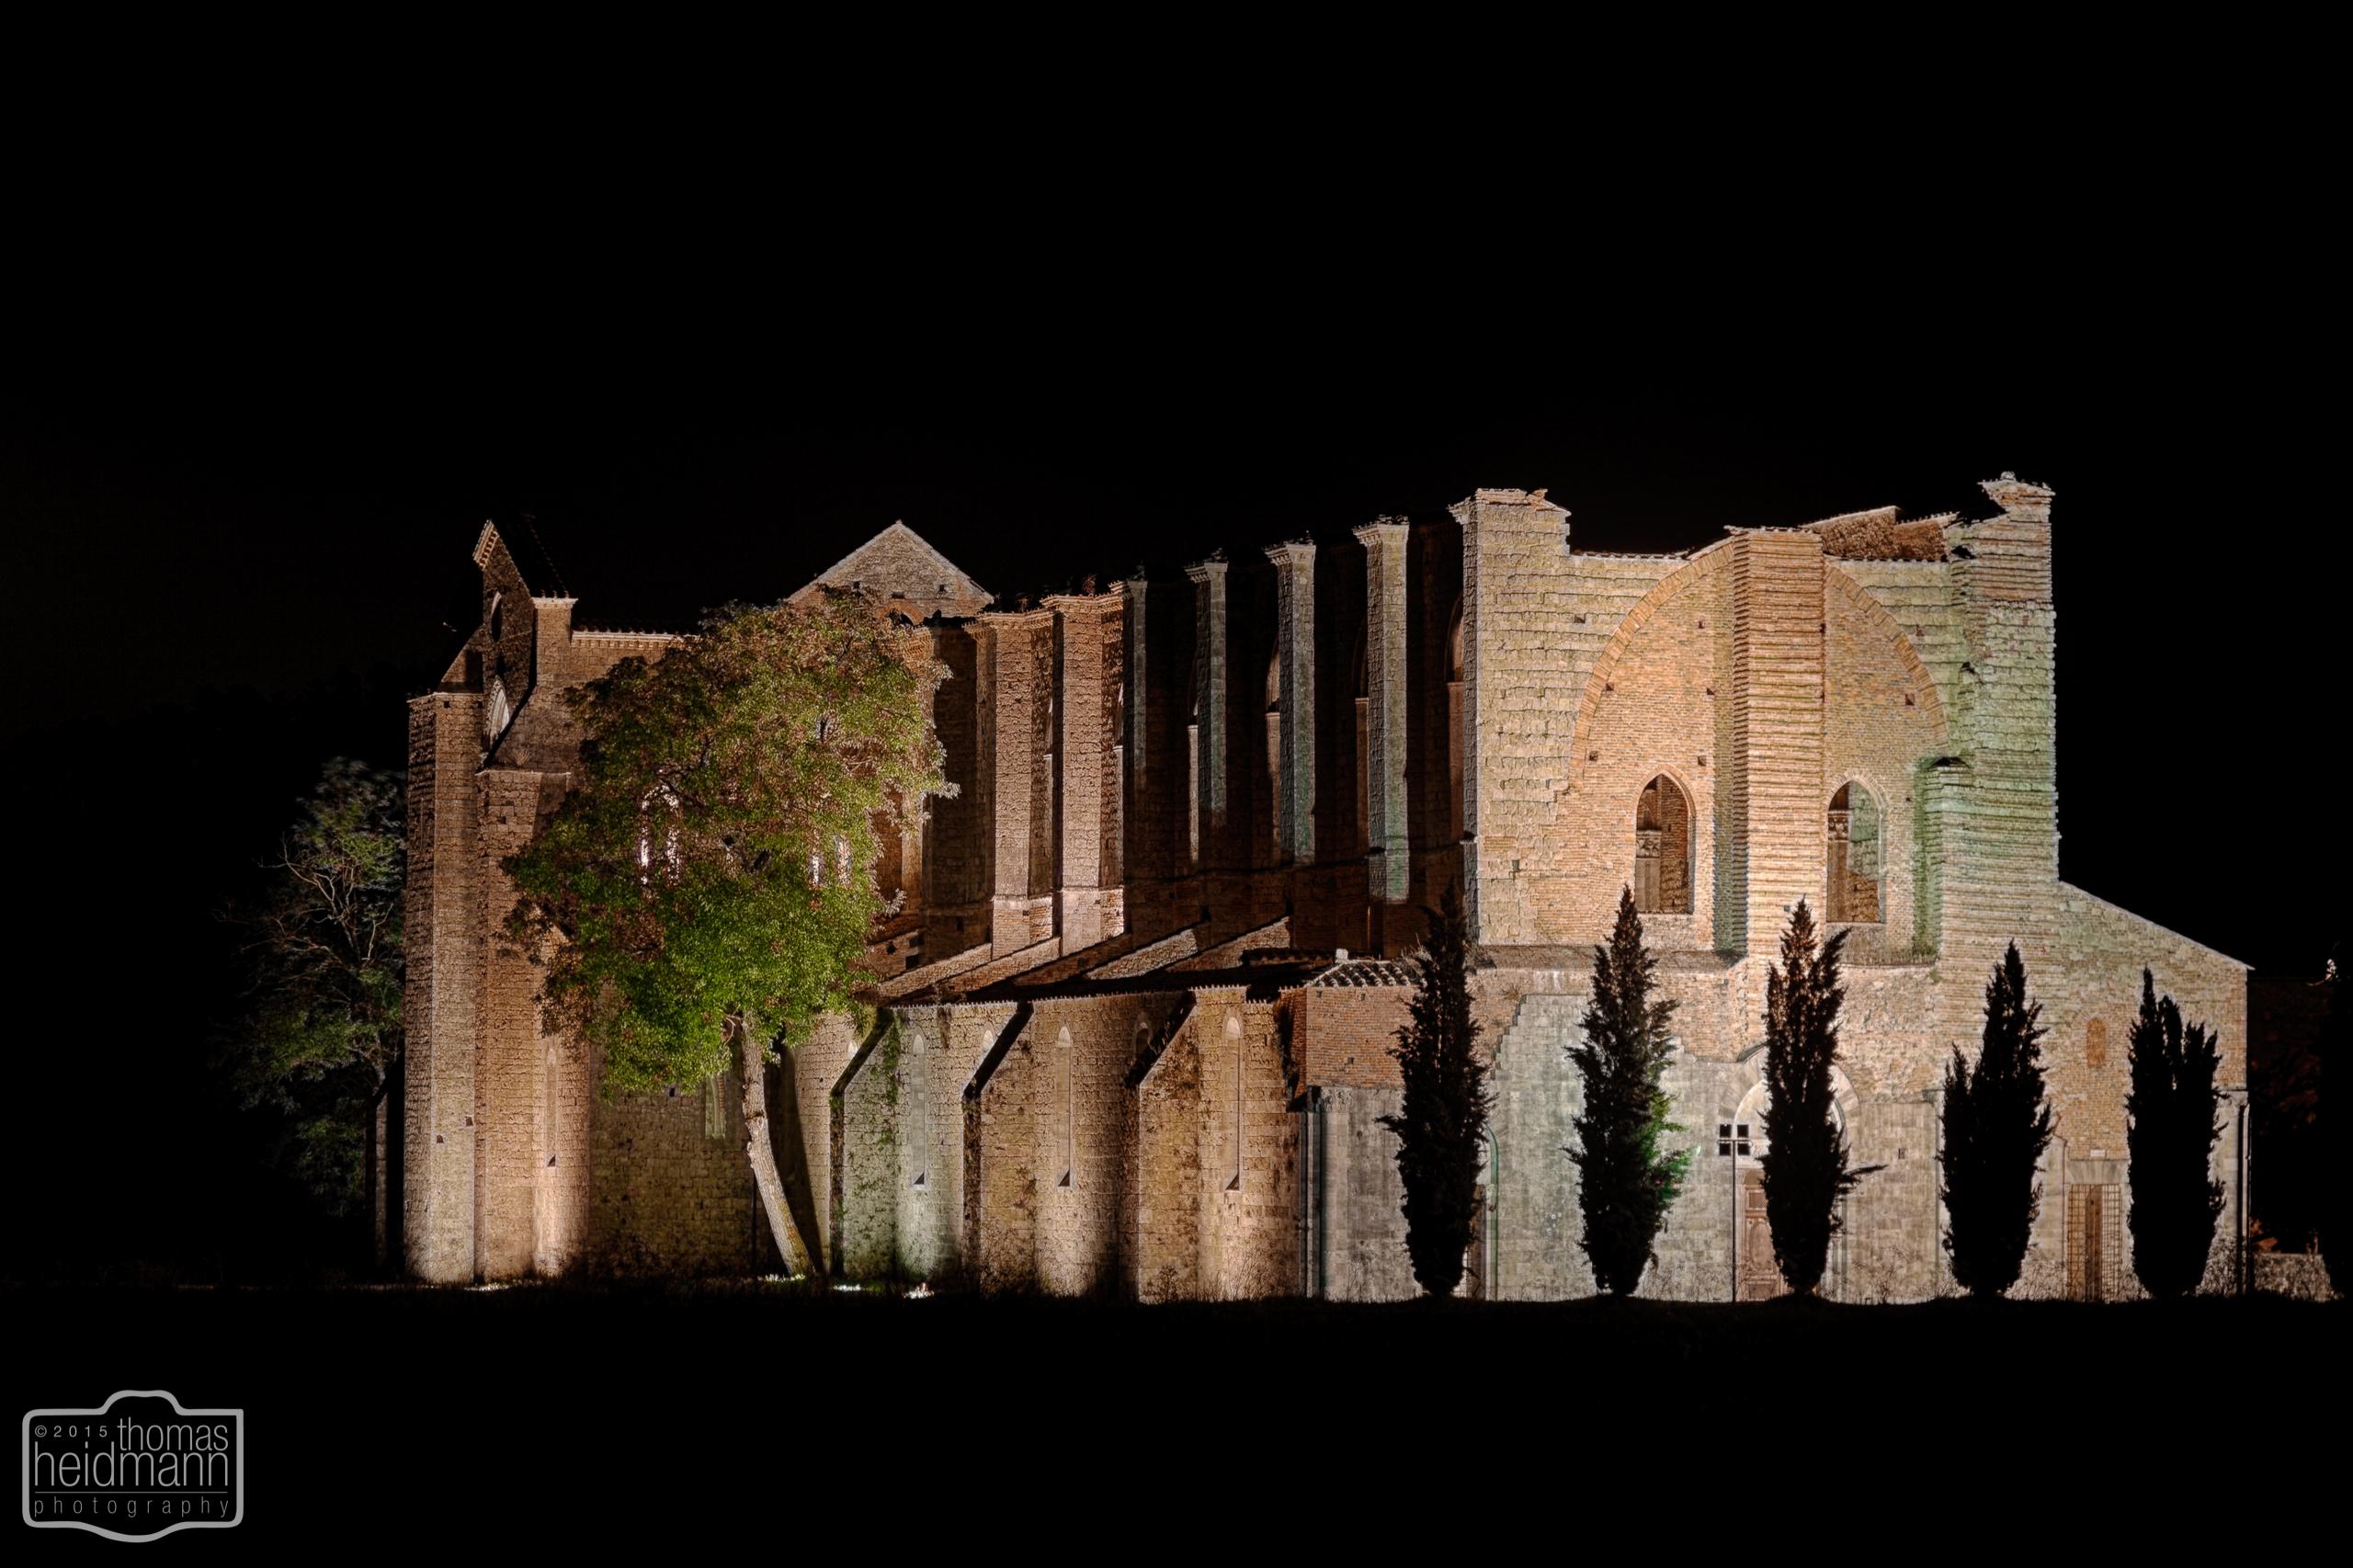 Klosterruine San Galgano bei Nacht